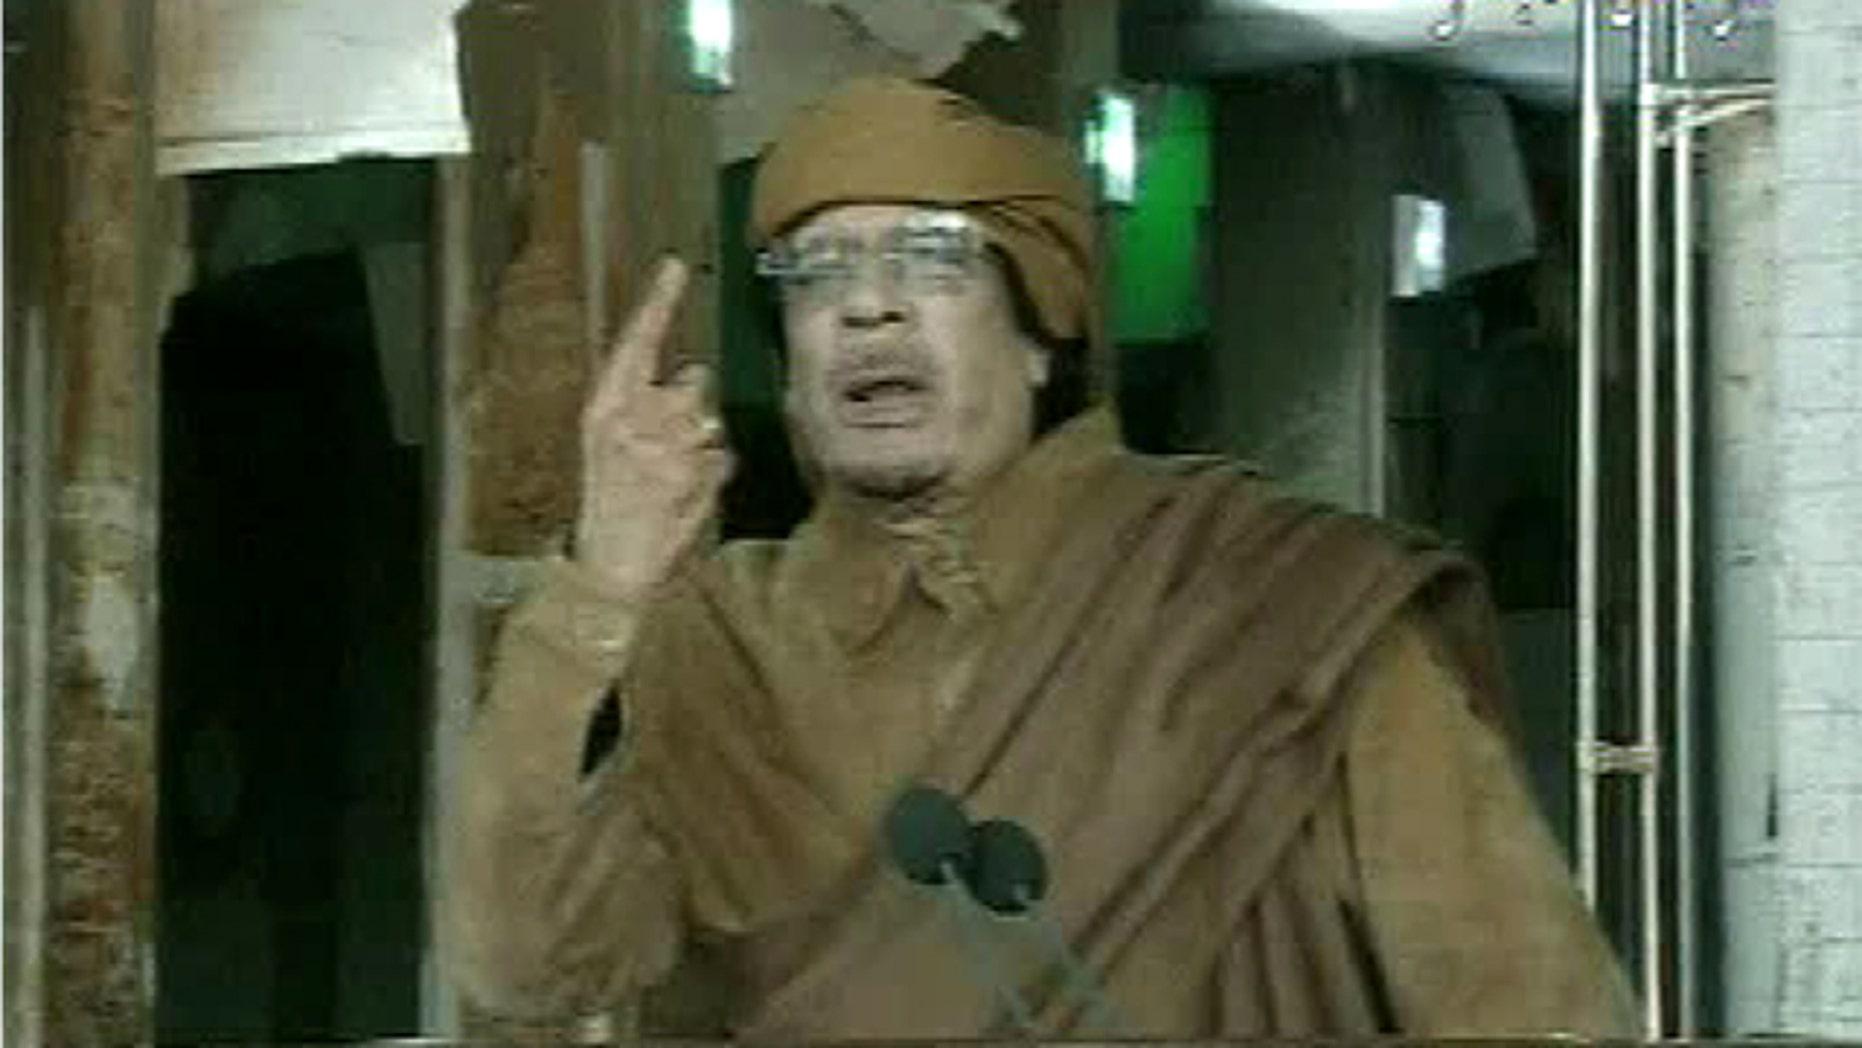 Feb. 22, 2011: This image broadcast on Libyan state television shows Libyan leader Muammar al-Qaddafi as he addresses the nation in Tripoli, Libya.